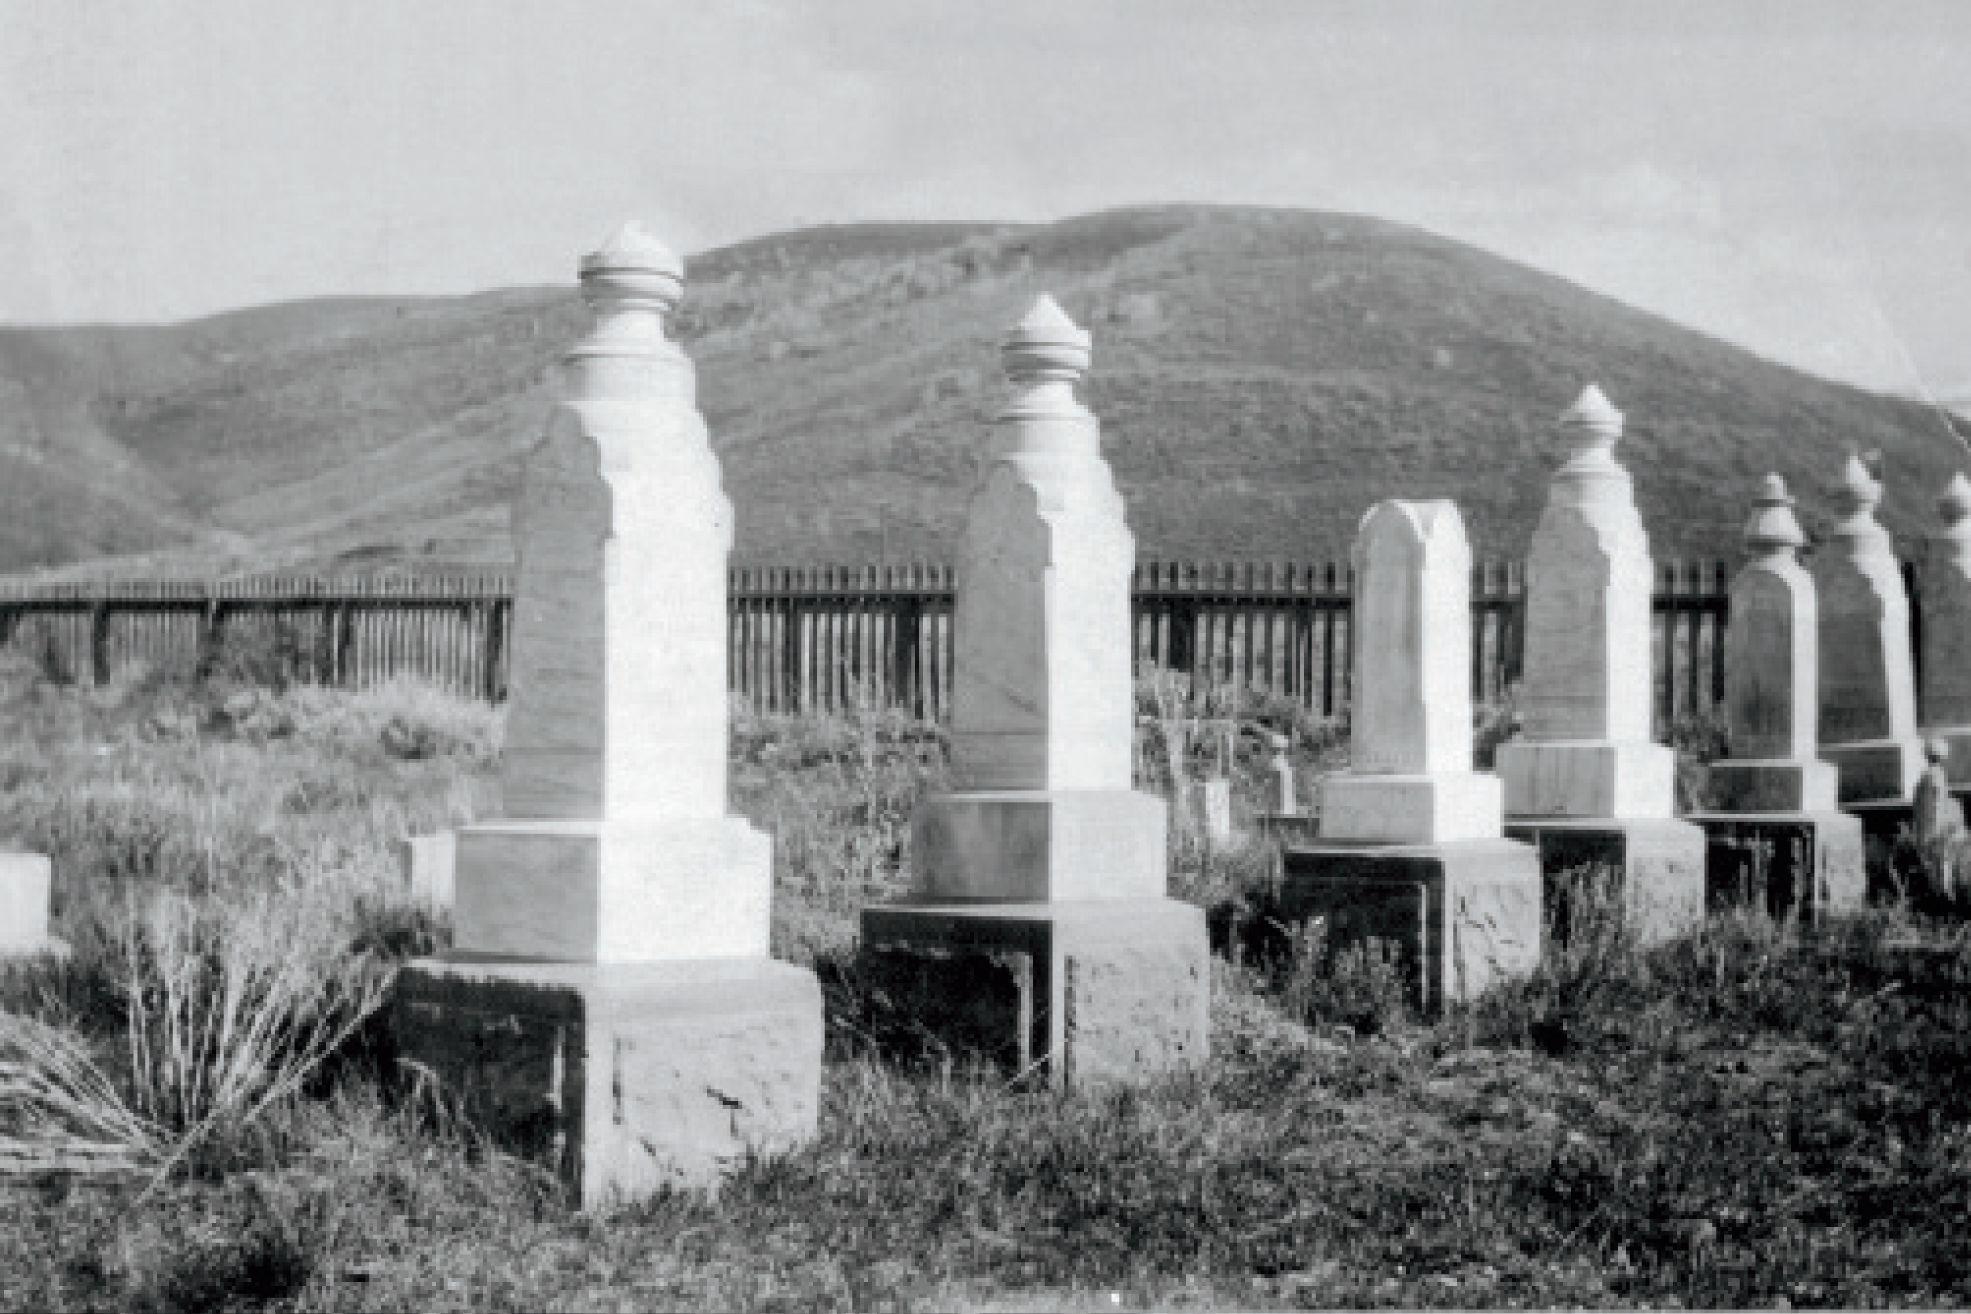 Pcsu 16 george snyder headstones tn9mvc